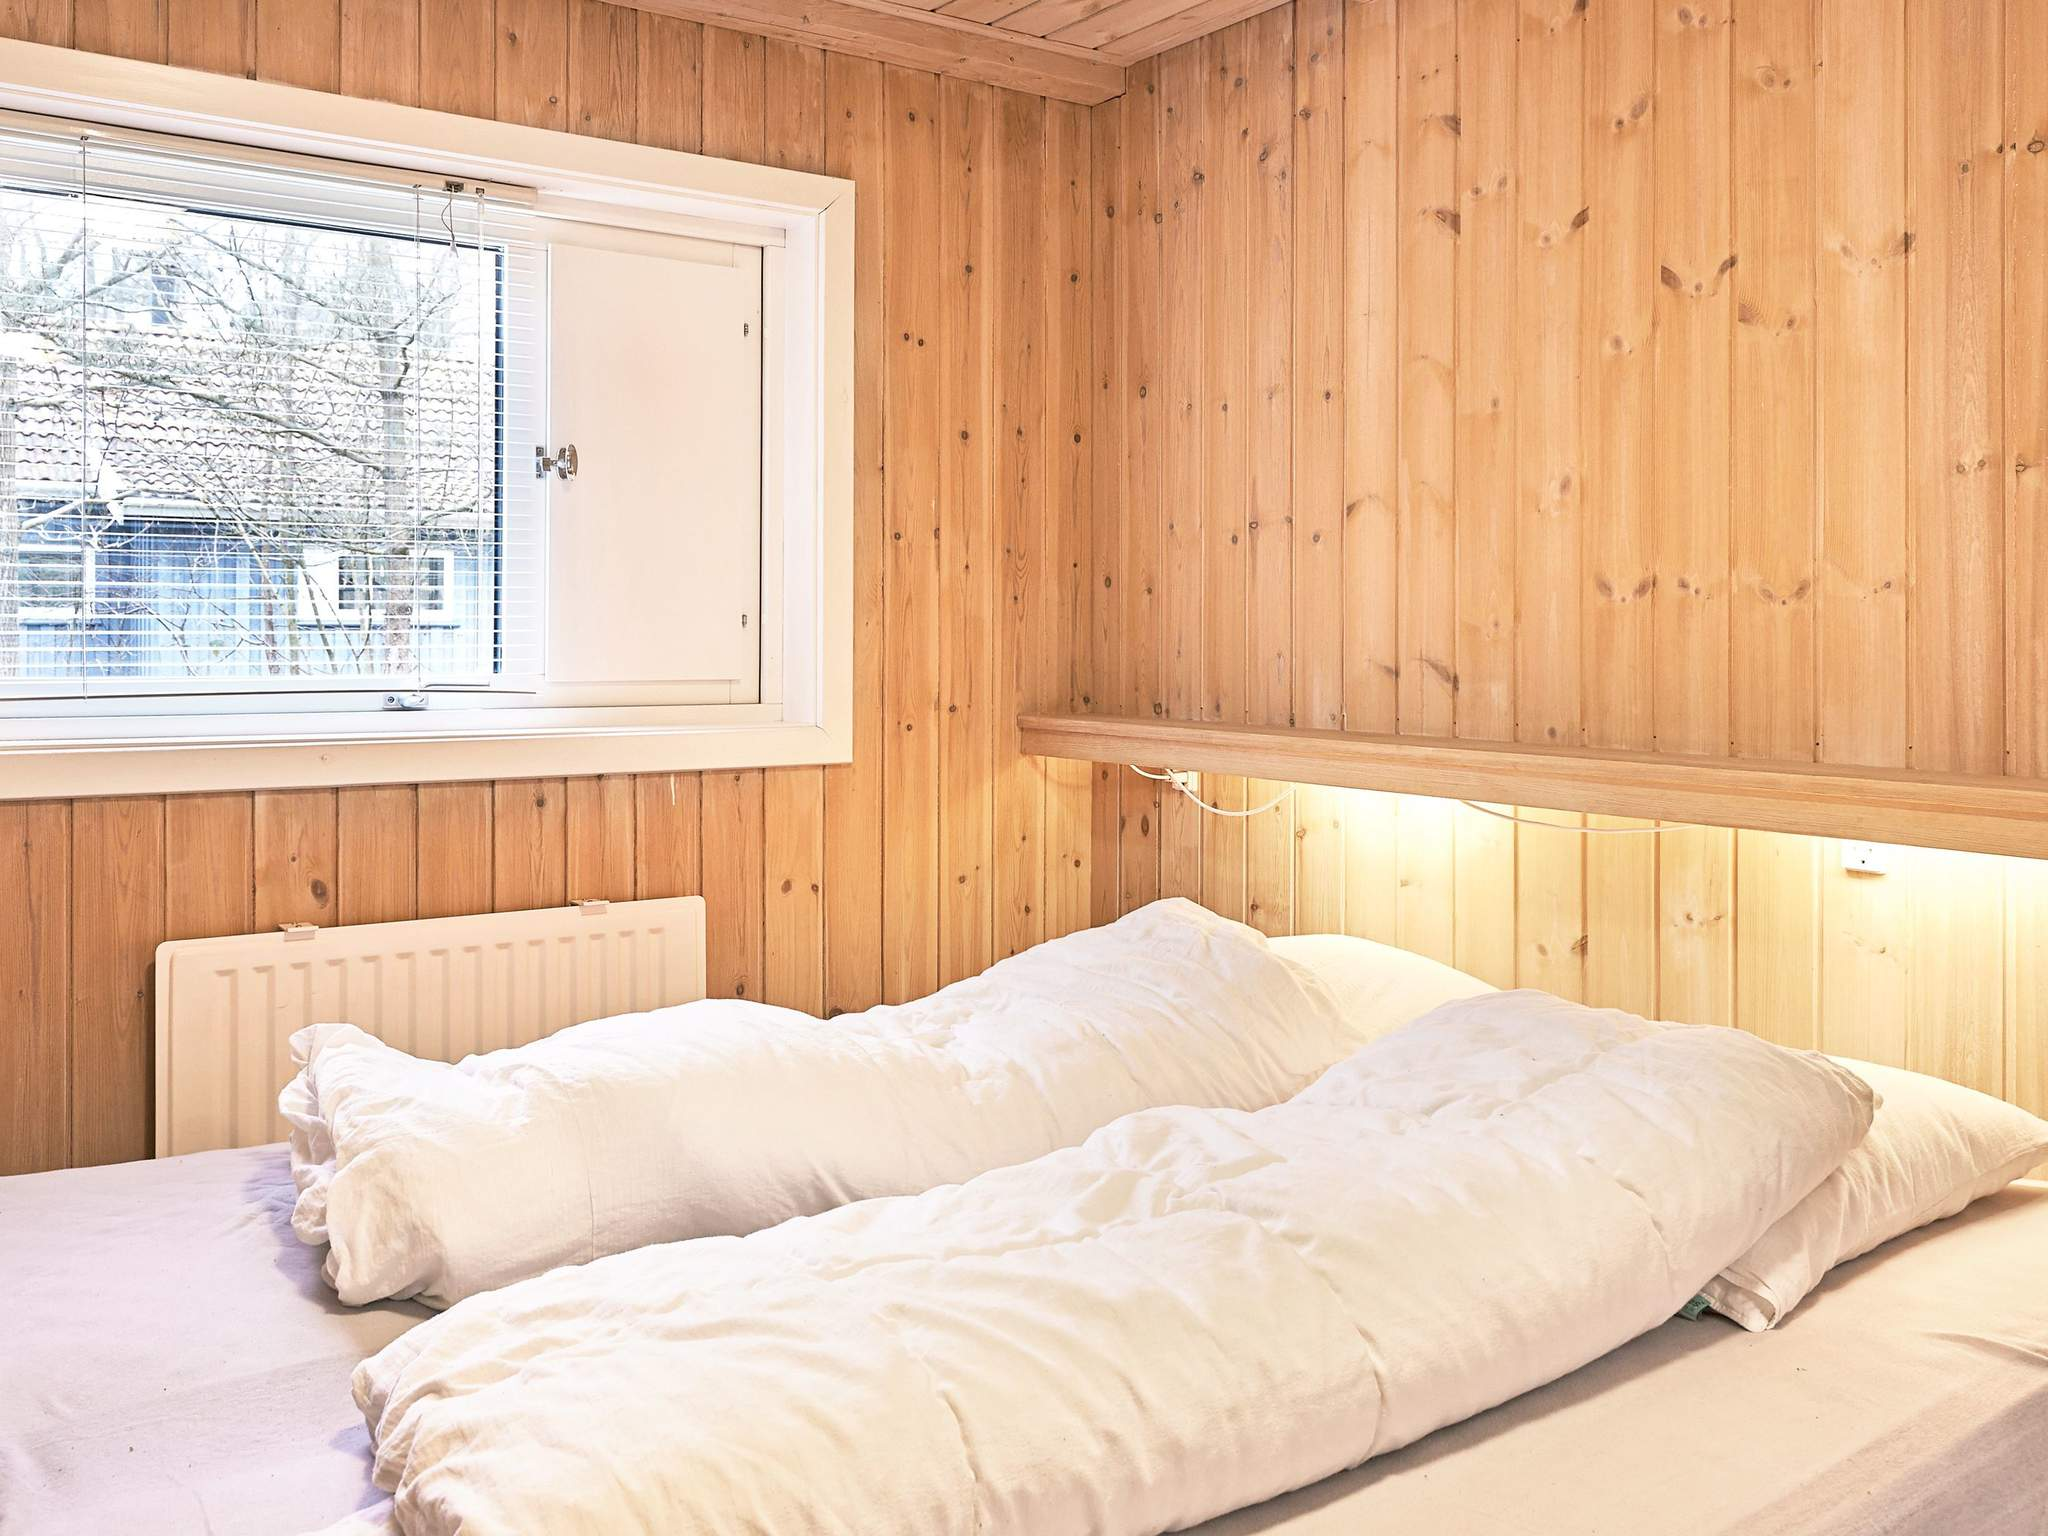 Maison de vacances Østre Sømarken (82542), Aakirkeby, , Bornholm, Danemark, image 7